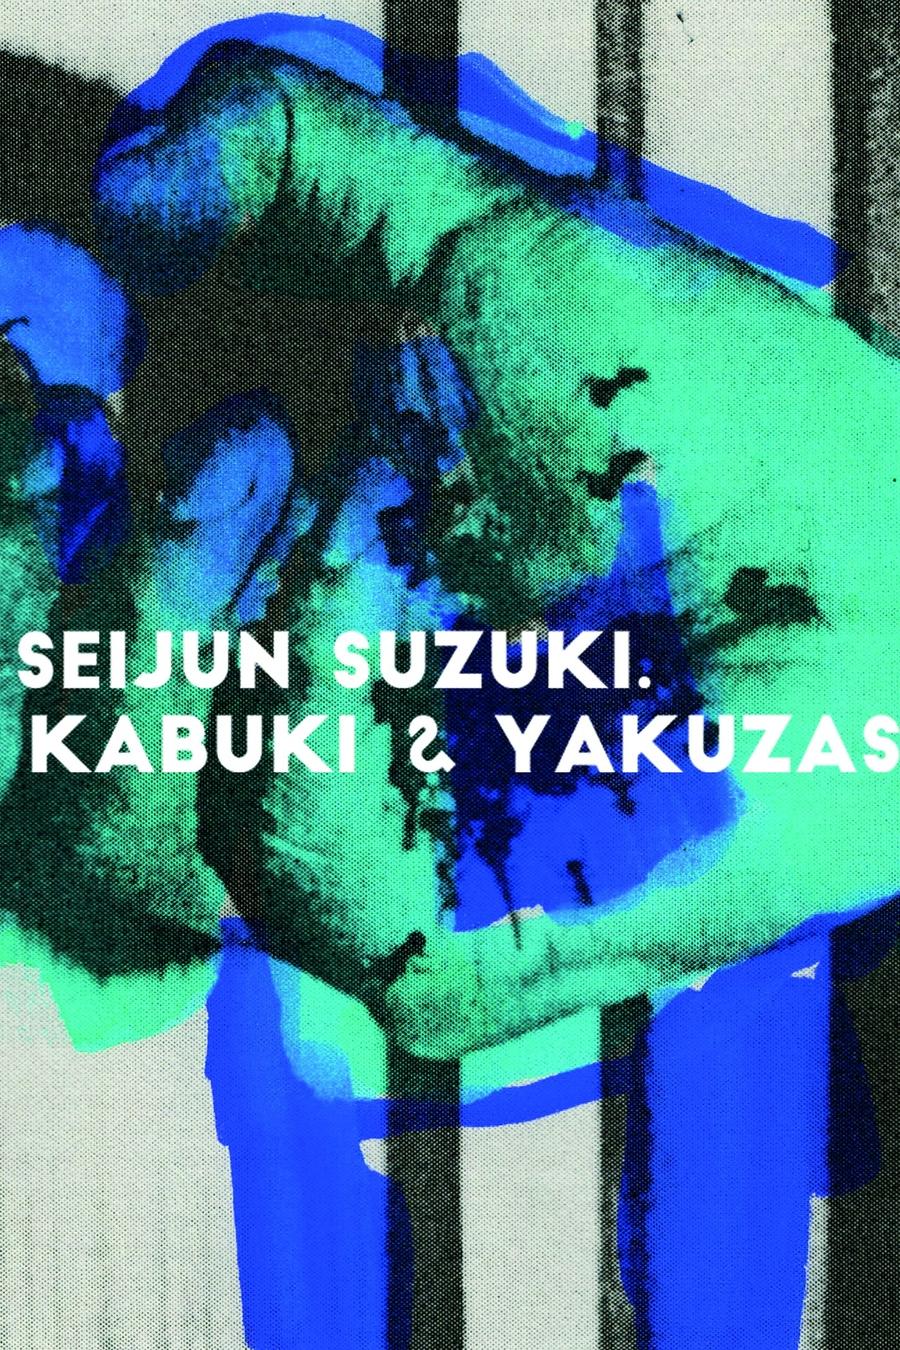 Seijun Suzuki: Kabuki & Yakuzas